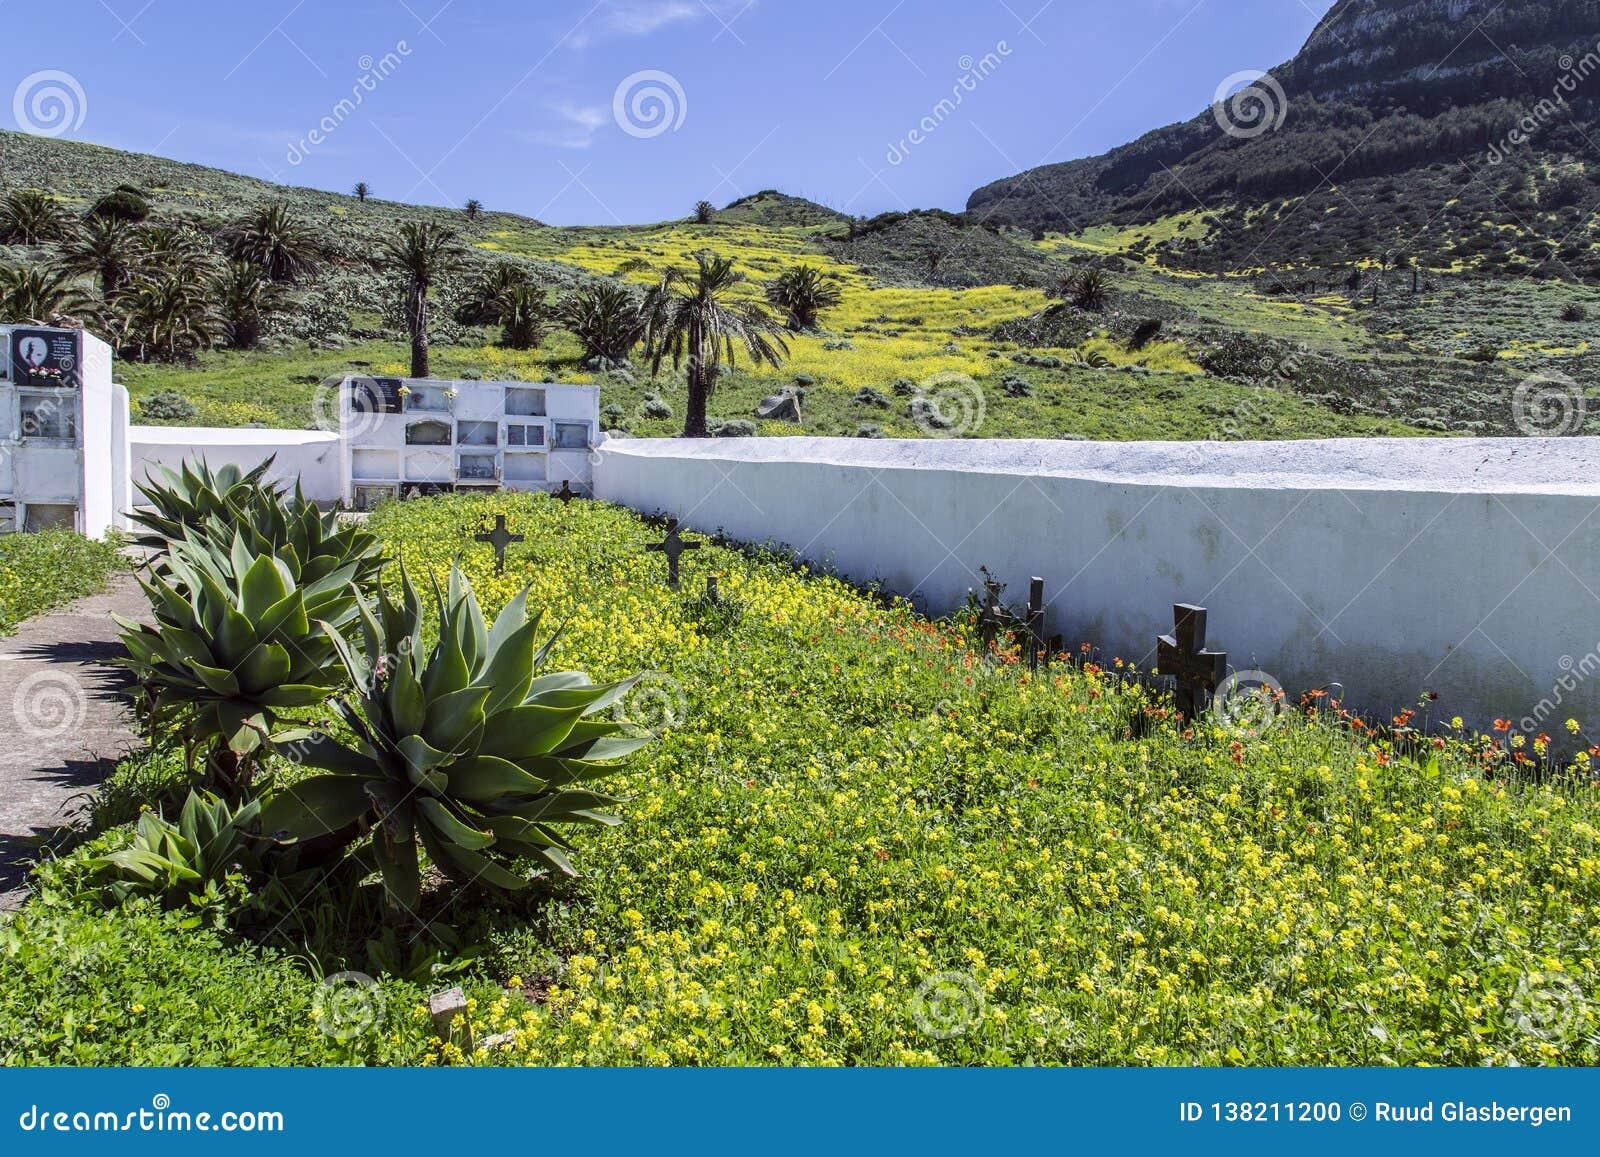 Cemetery in the mountains of La Gomera